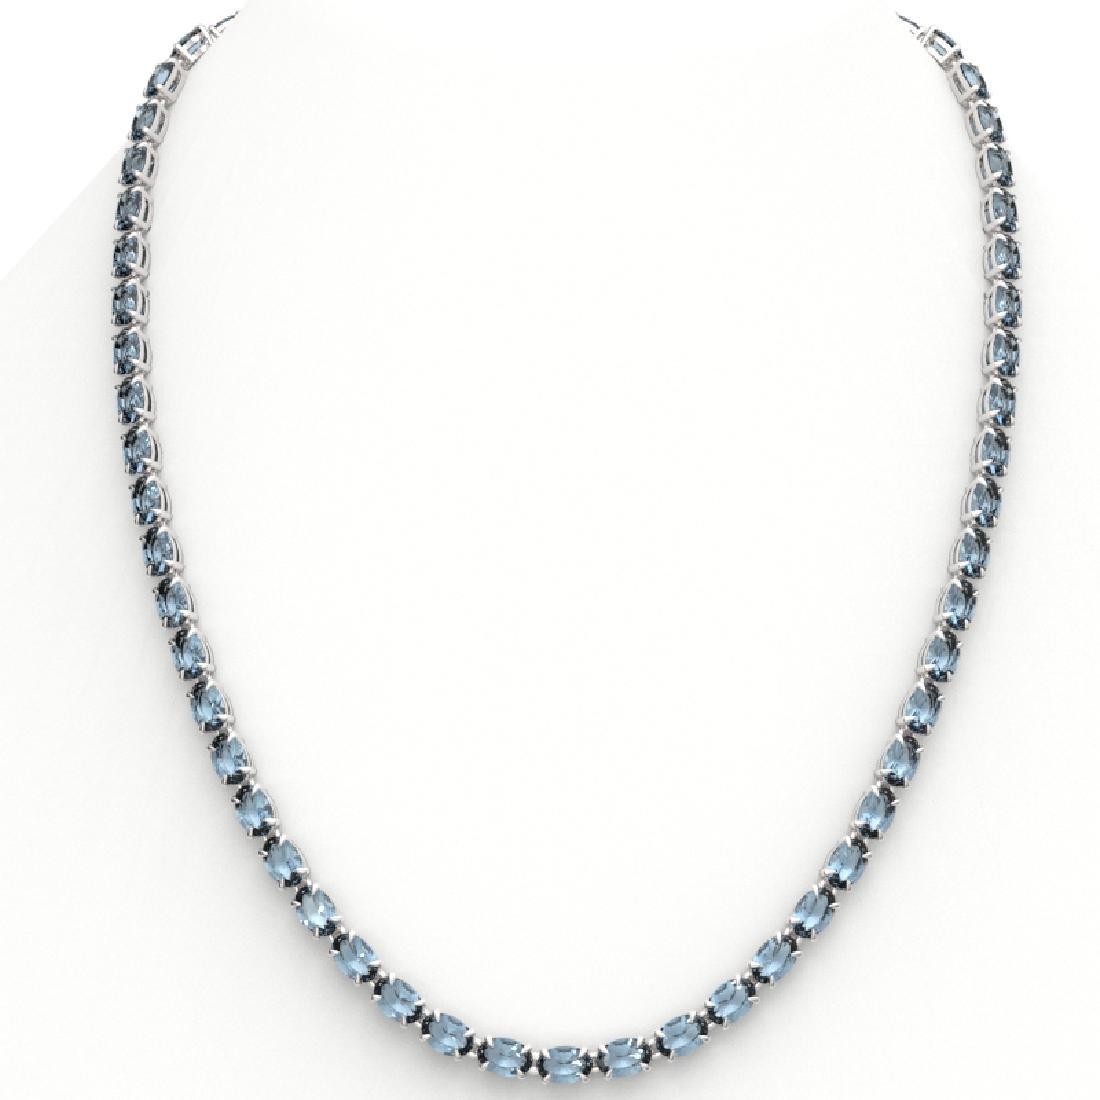 29 CTW Aquamarine Eternity Tennis Necklace 14K White - 3